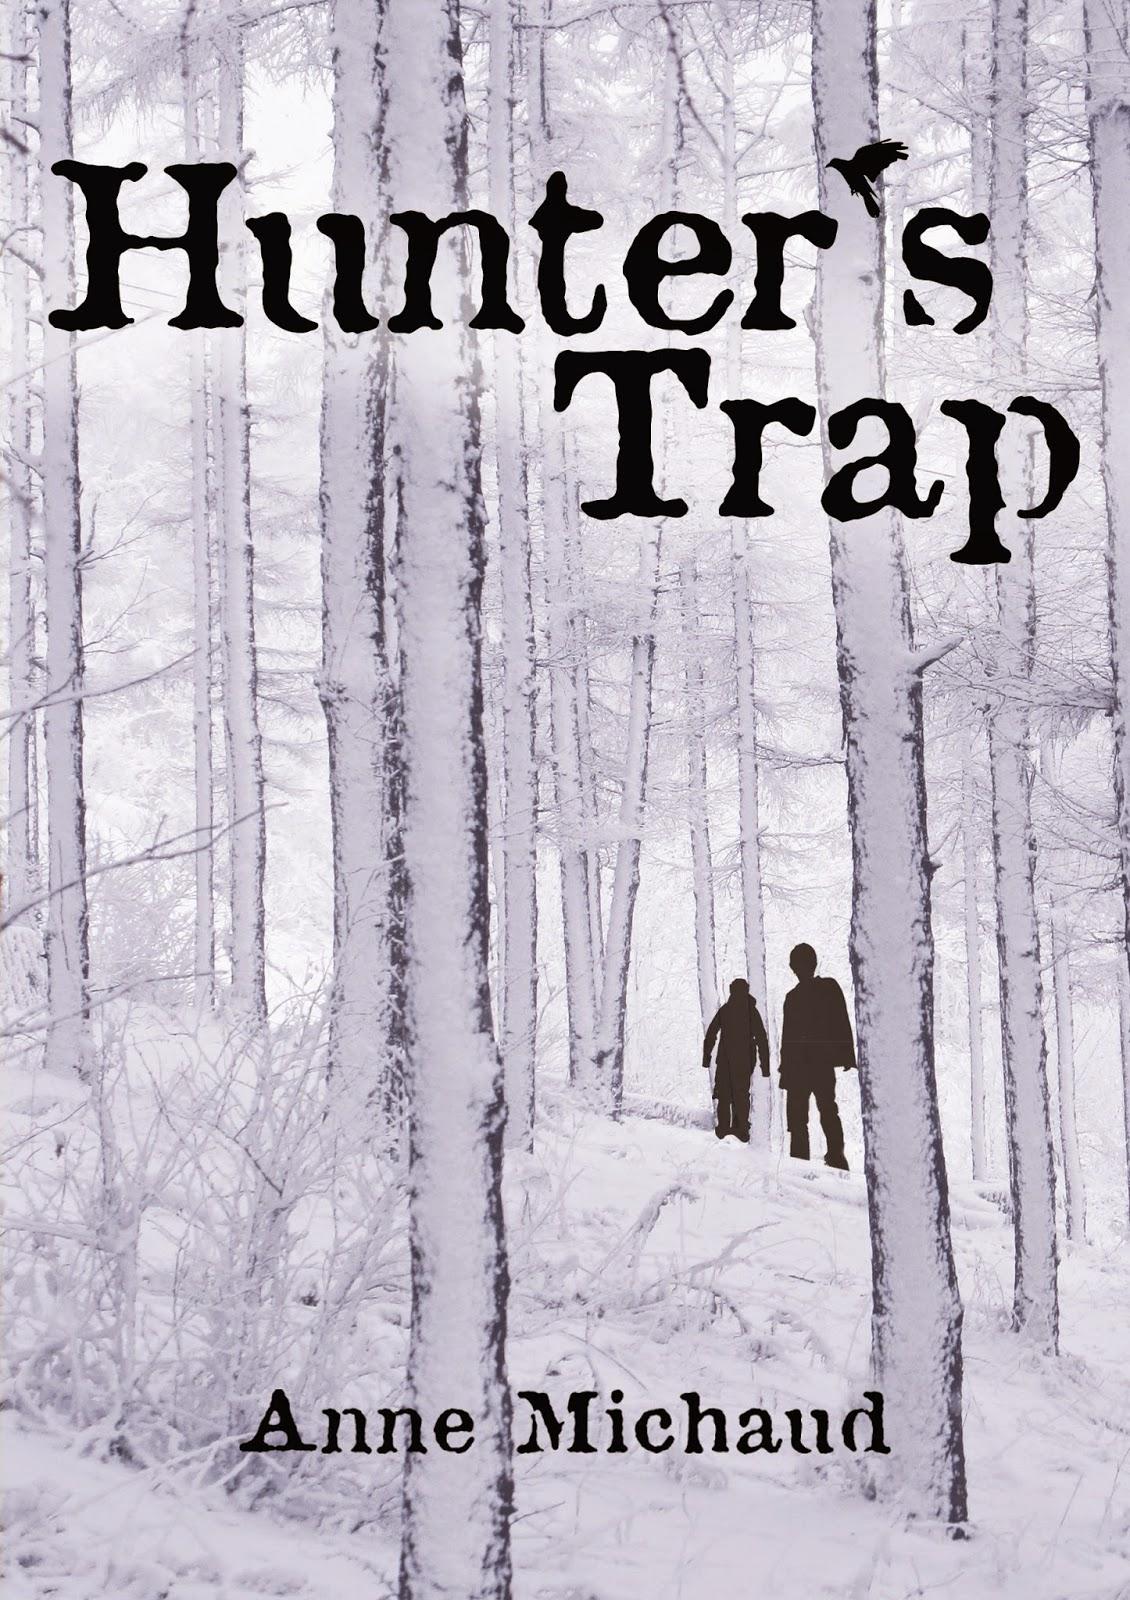 https://www.goodreads.com/book/show/22674236-hunter-s-trap